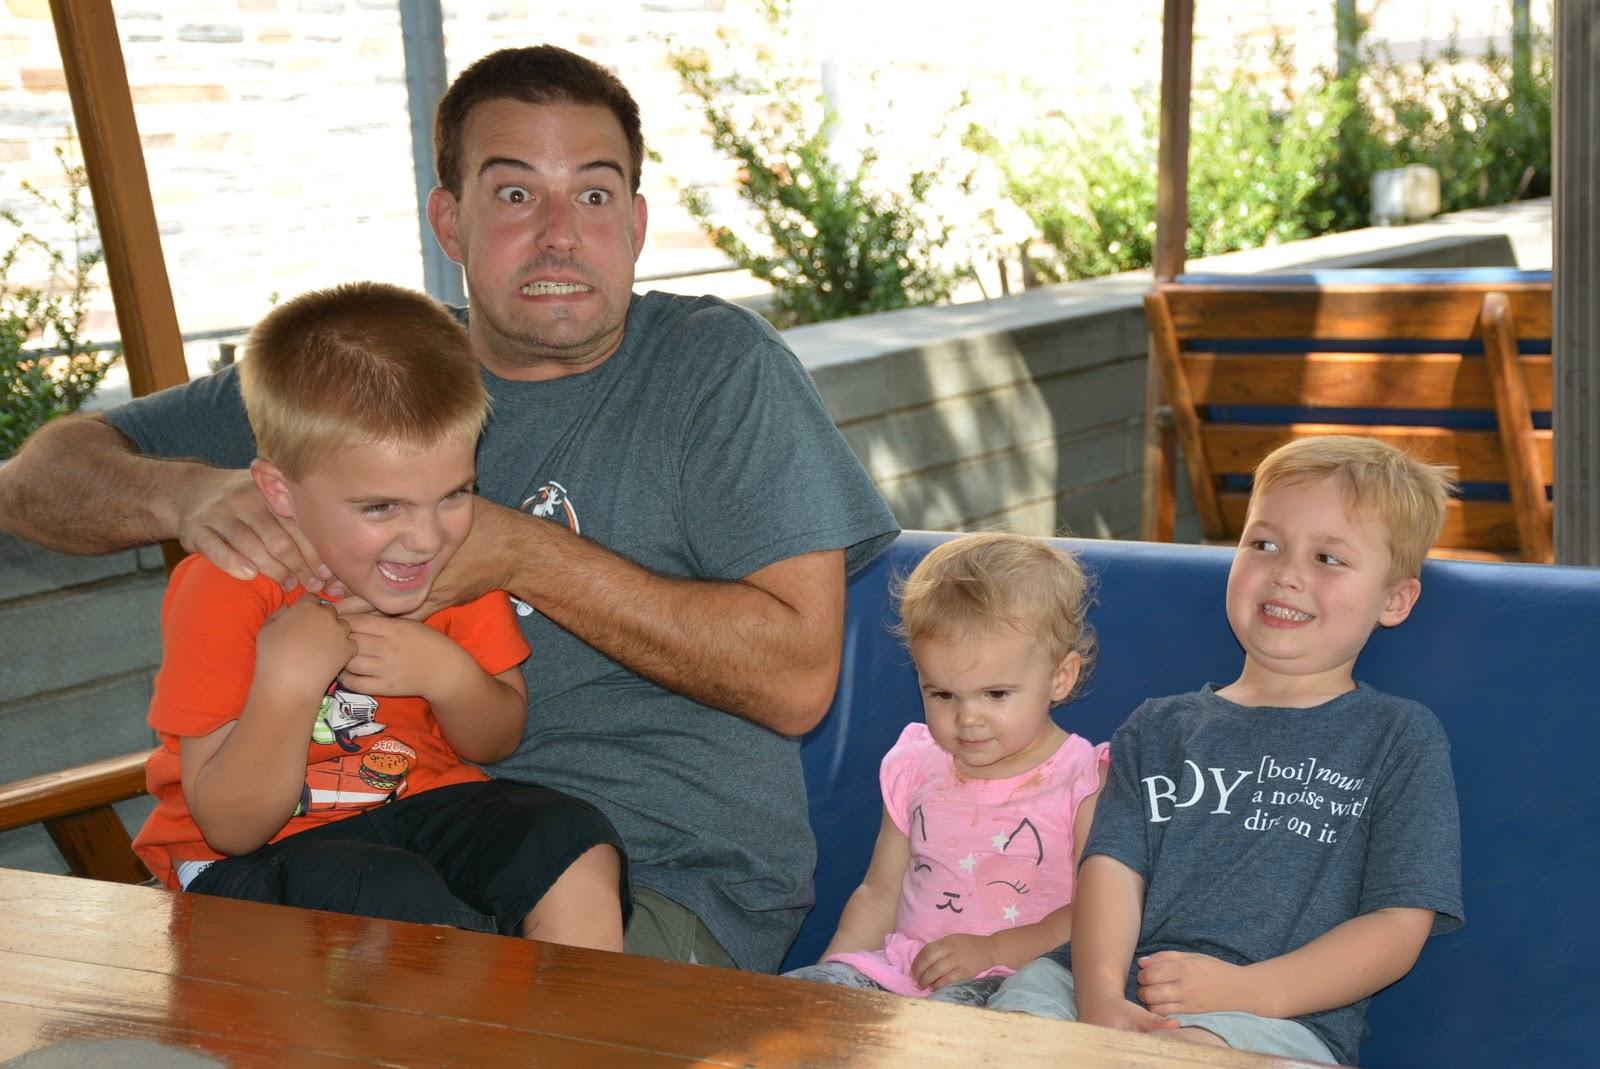 Stephen and kids